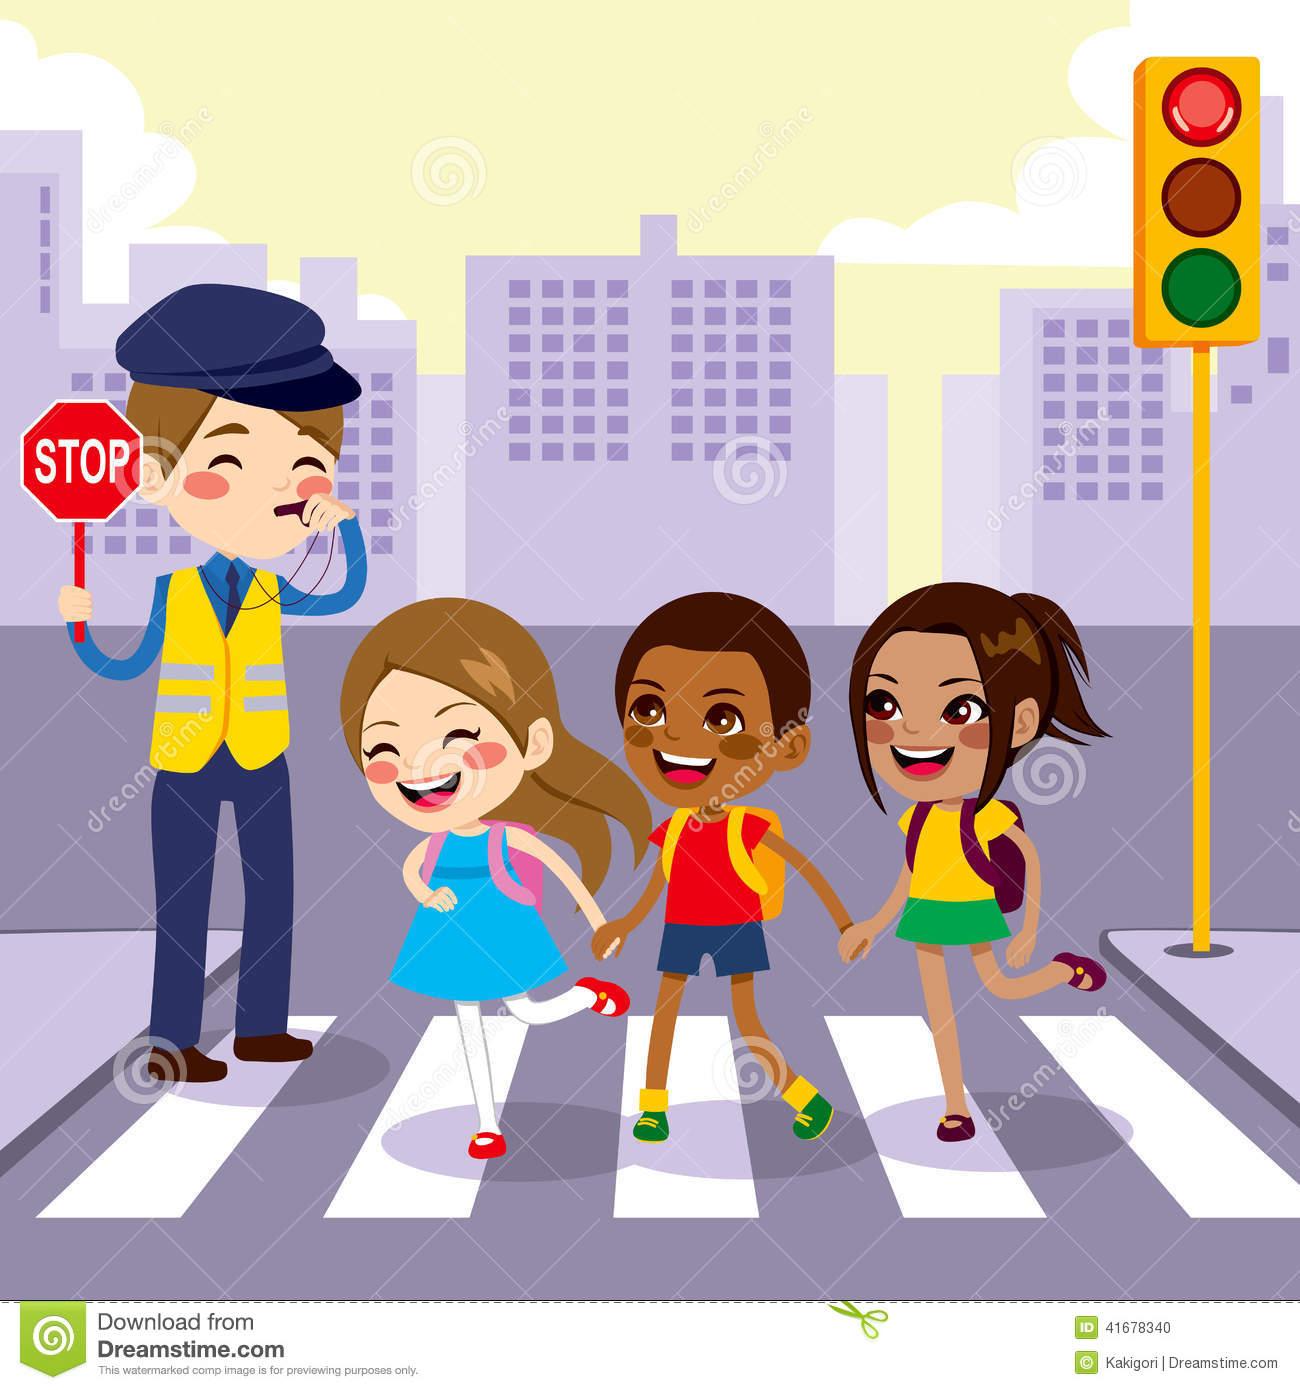 Zebra clipart road People road School crossing Clip